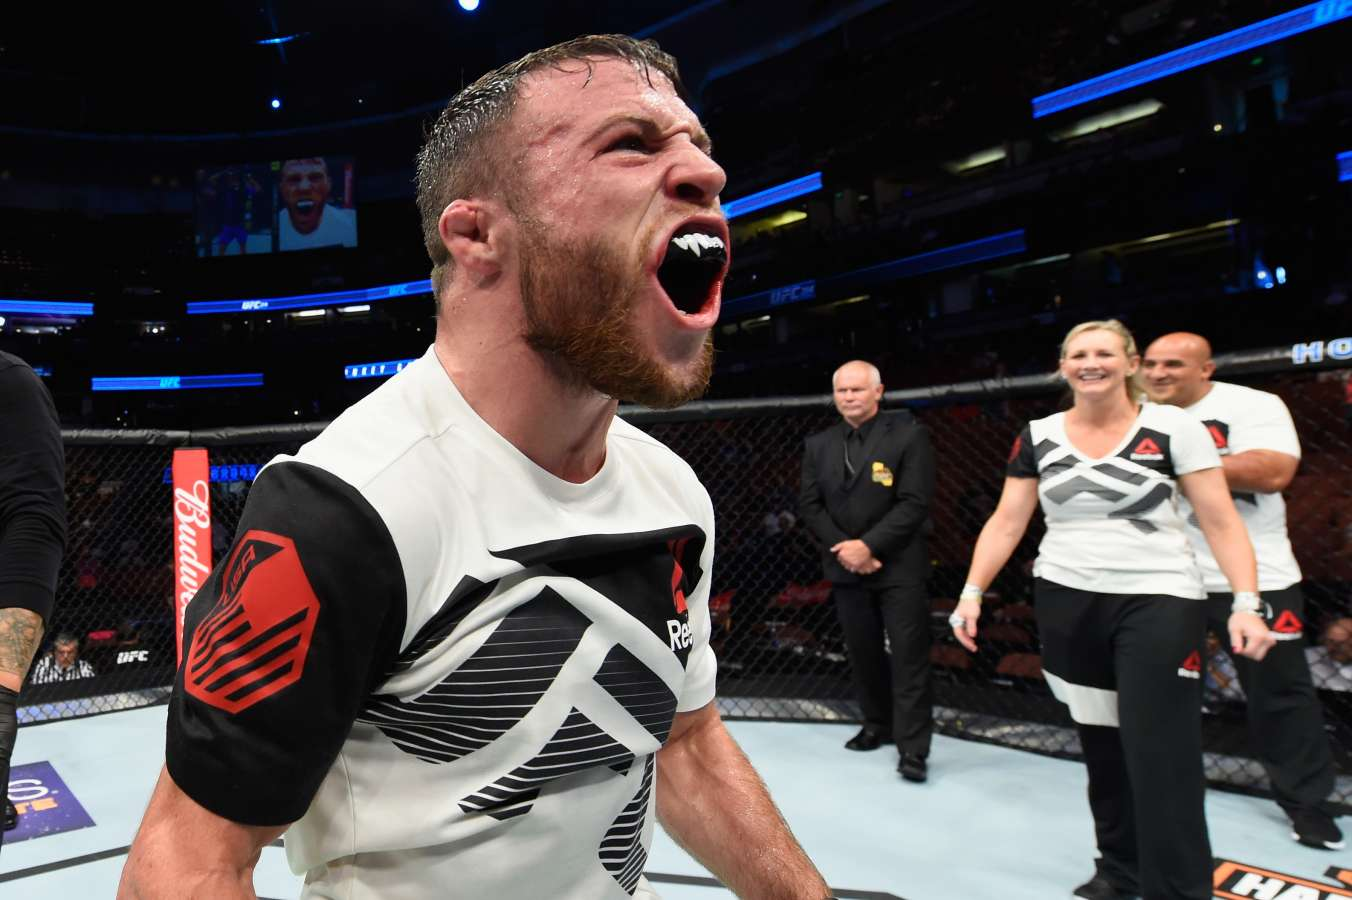 UFC Bloopers: Brooks screws up slam, knocks himself out